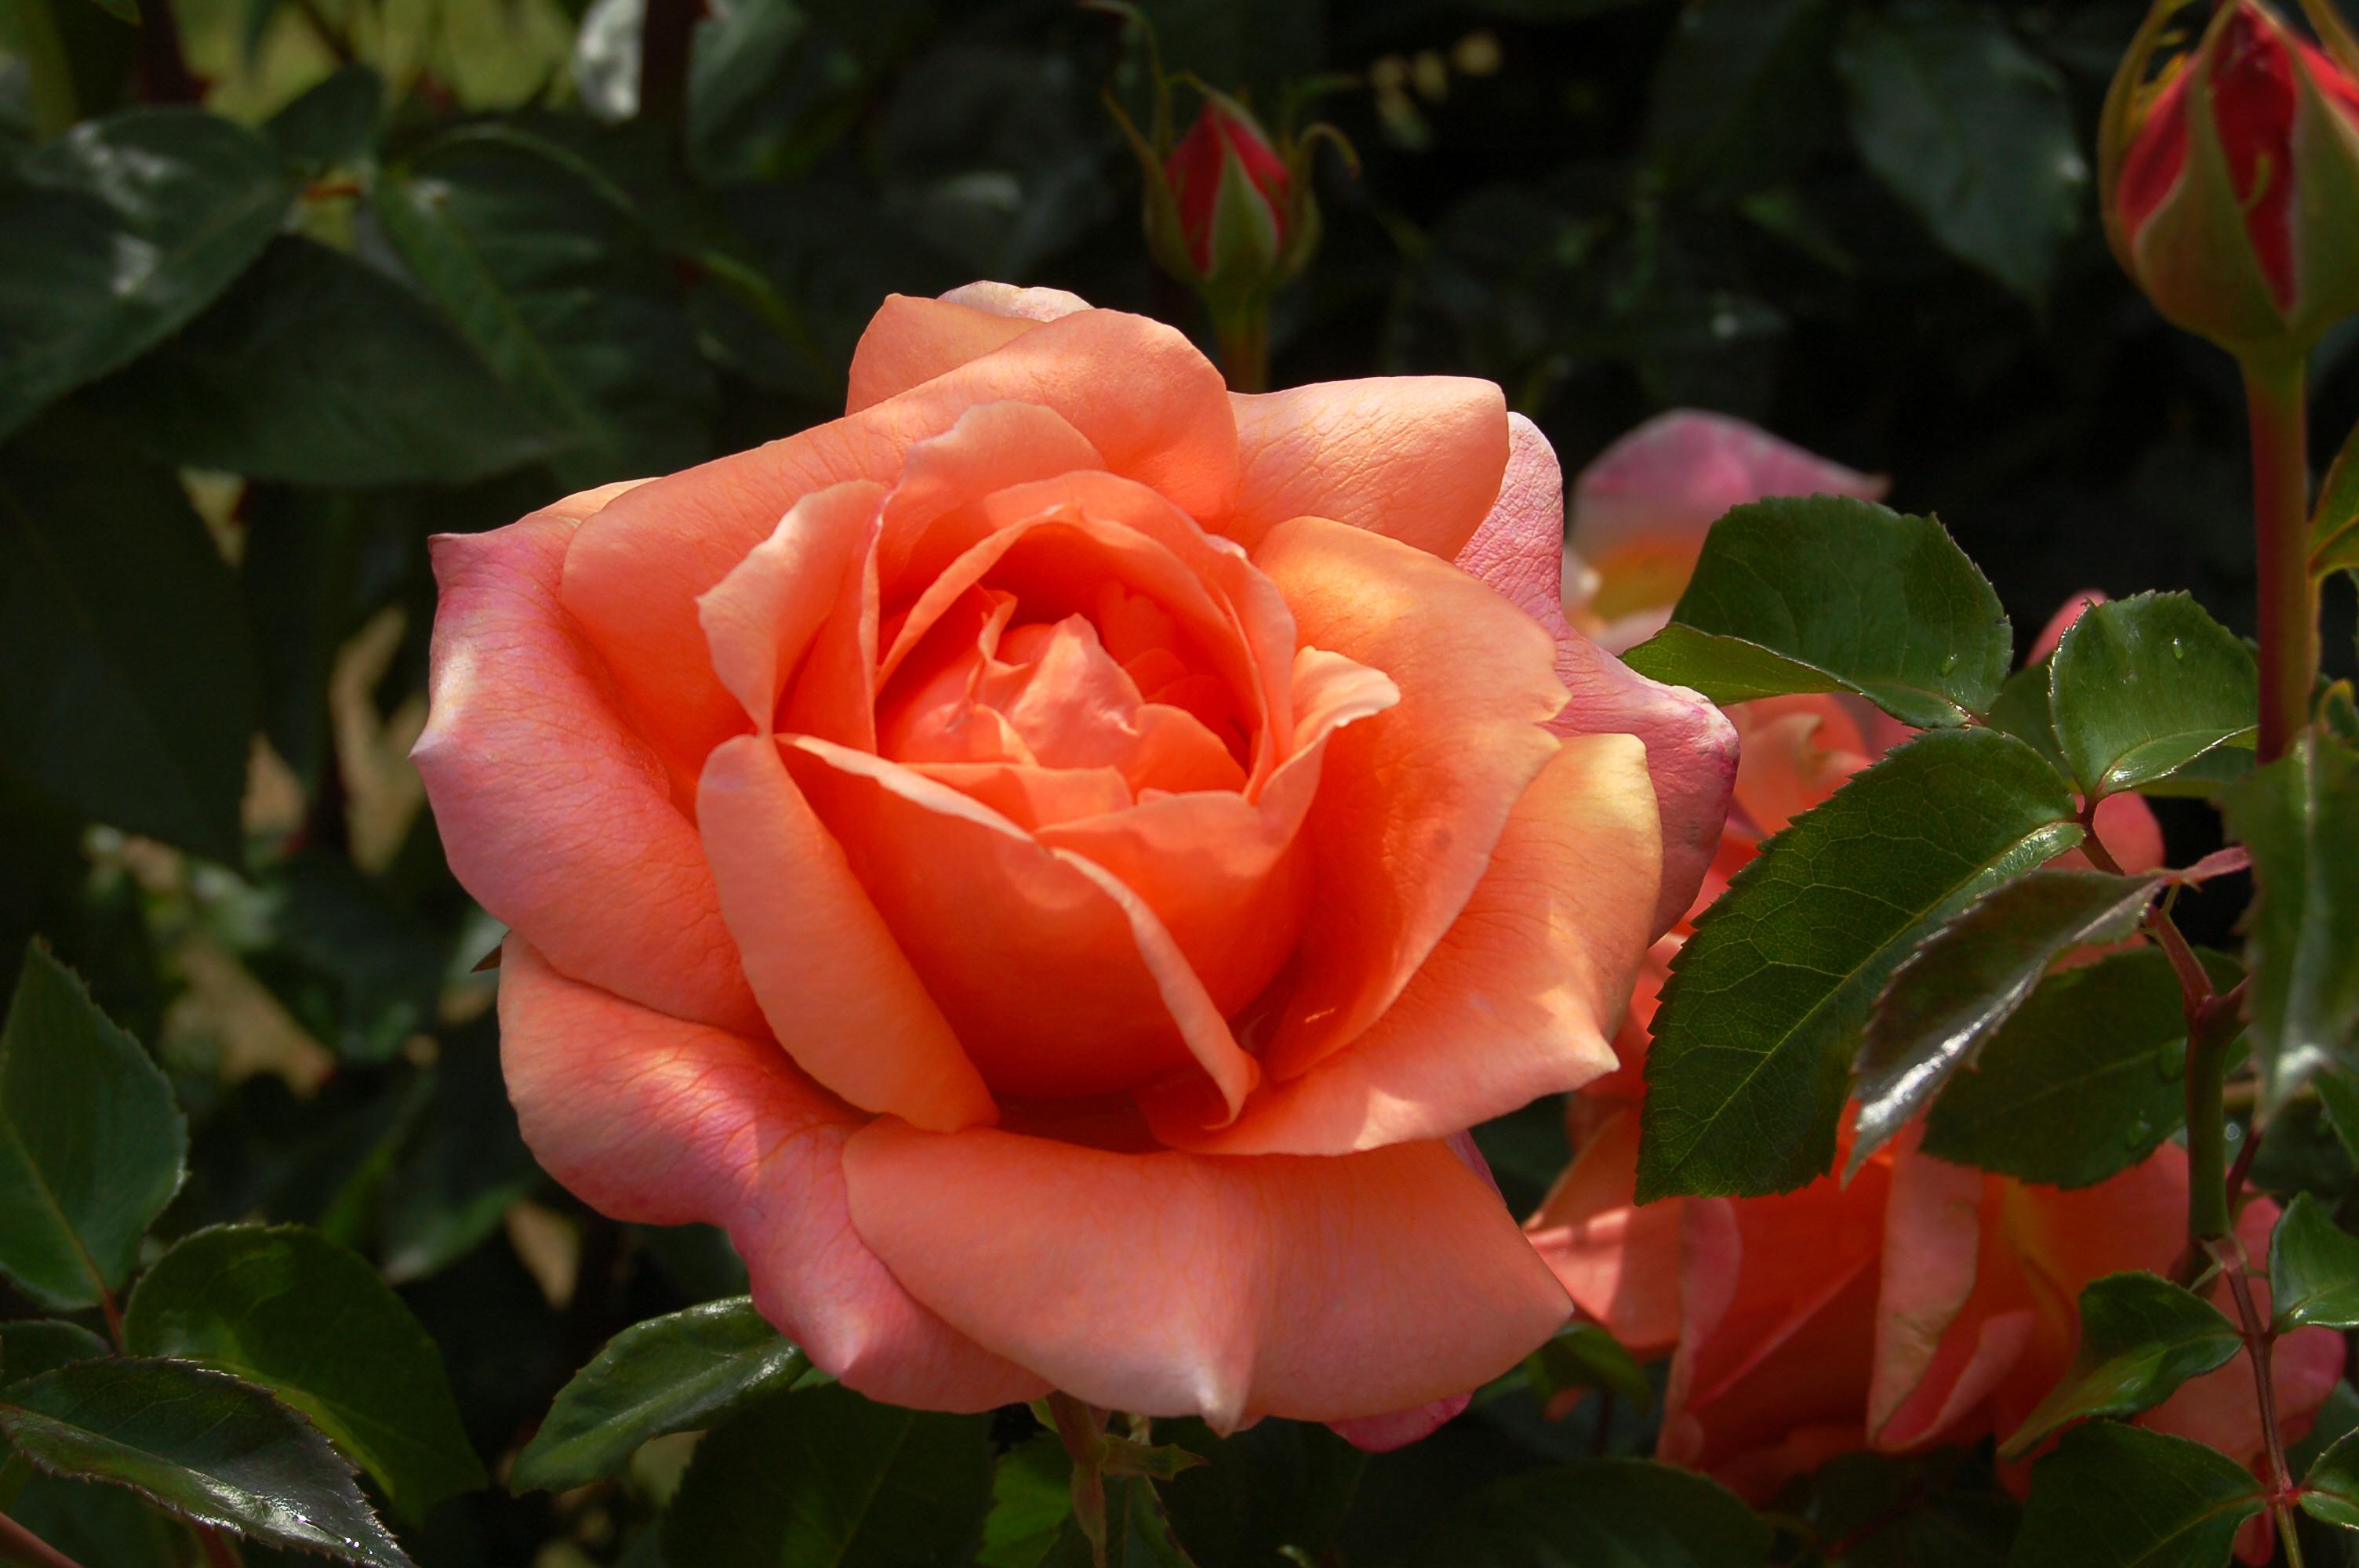 Rosa 'Cherry Brandy', roos, eetbare bloemen, tuinseizoen